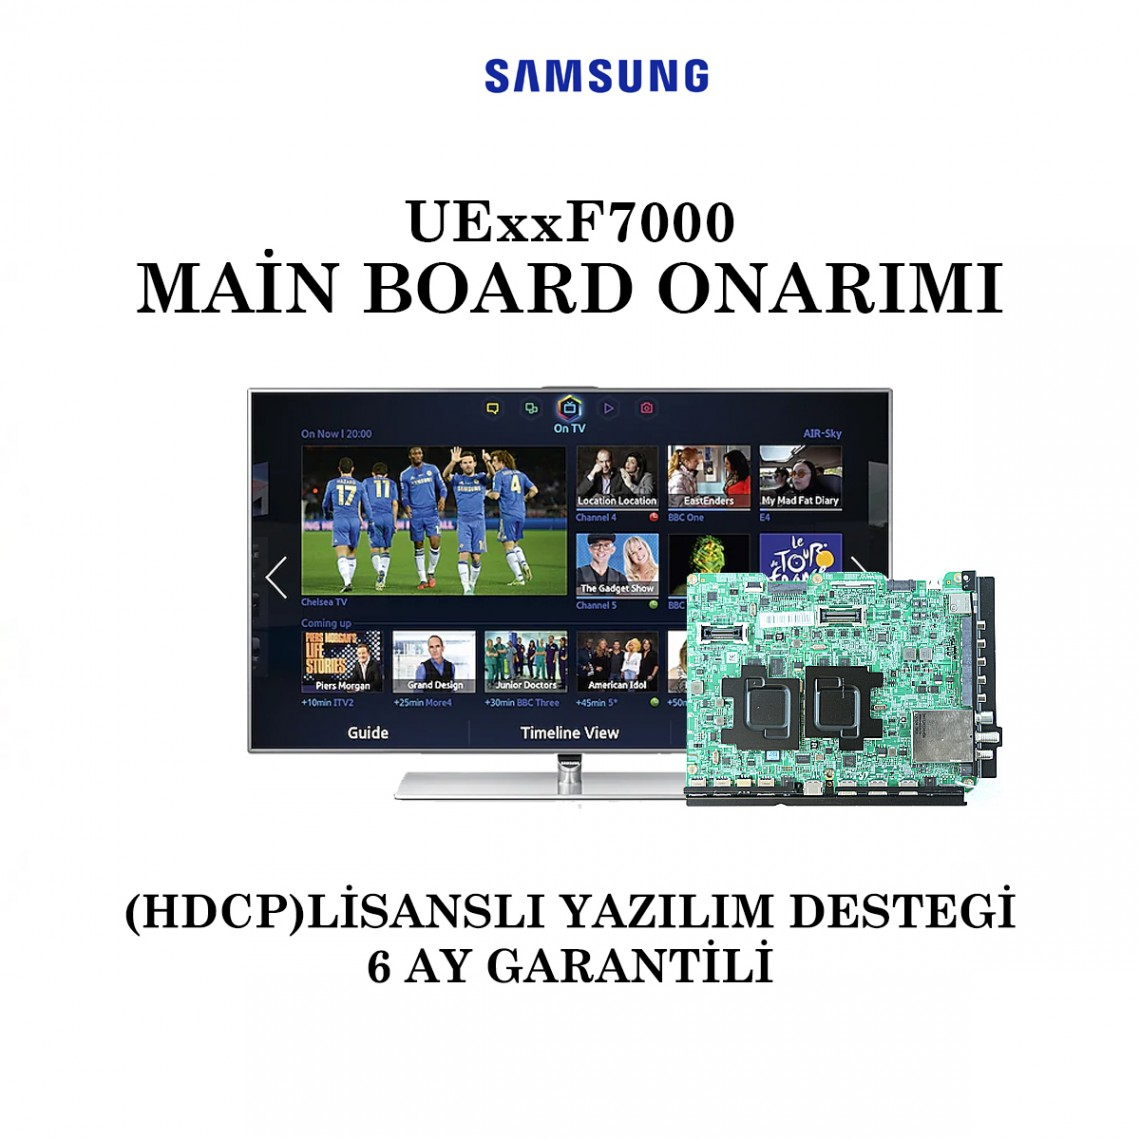 SAMSUNG, BN41-01973A, UE40F7000, UE46F7000, UE55F7000, UE60F7000, Main Board Onarımı